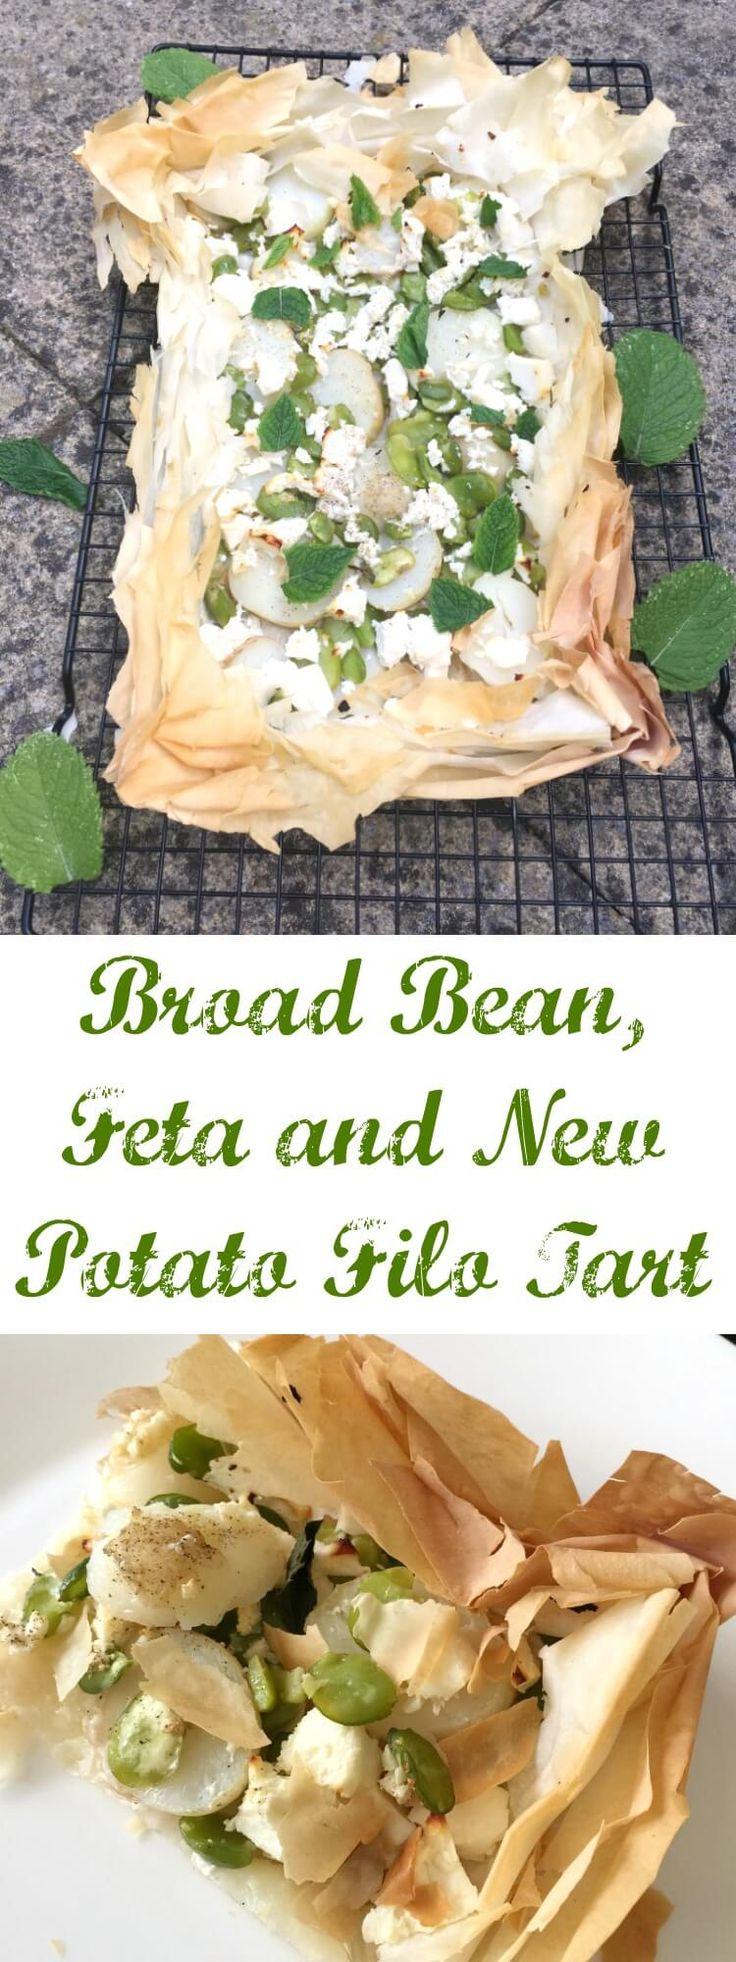 Broad bean, feta and new potato filo tart